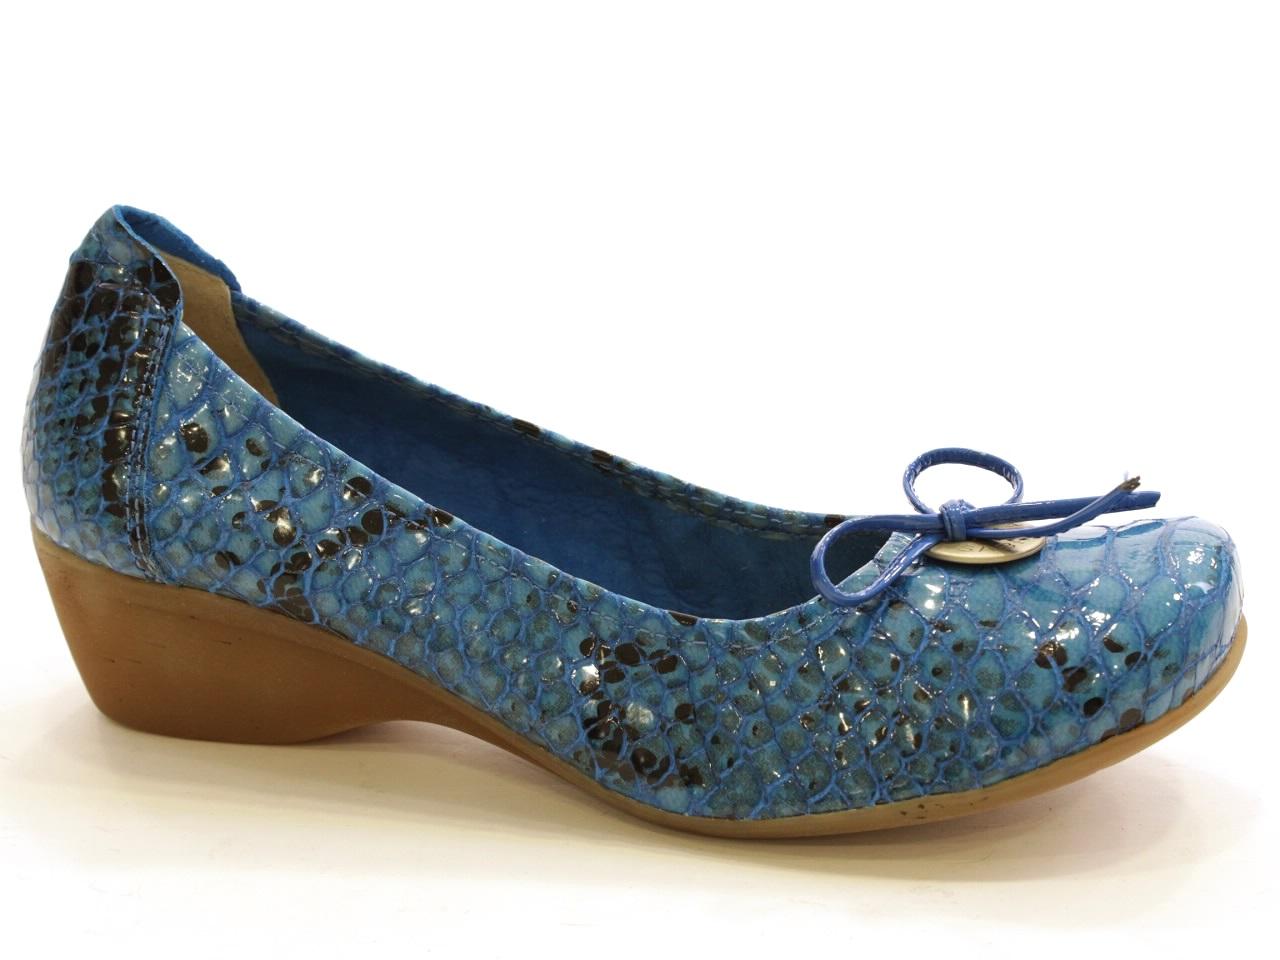 Wedge Shoes Sabrinas - 445 34016